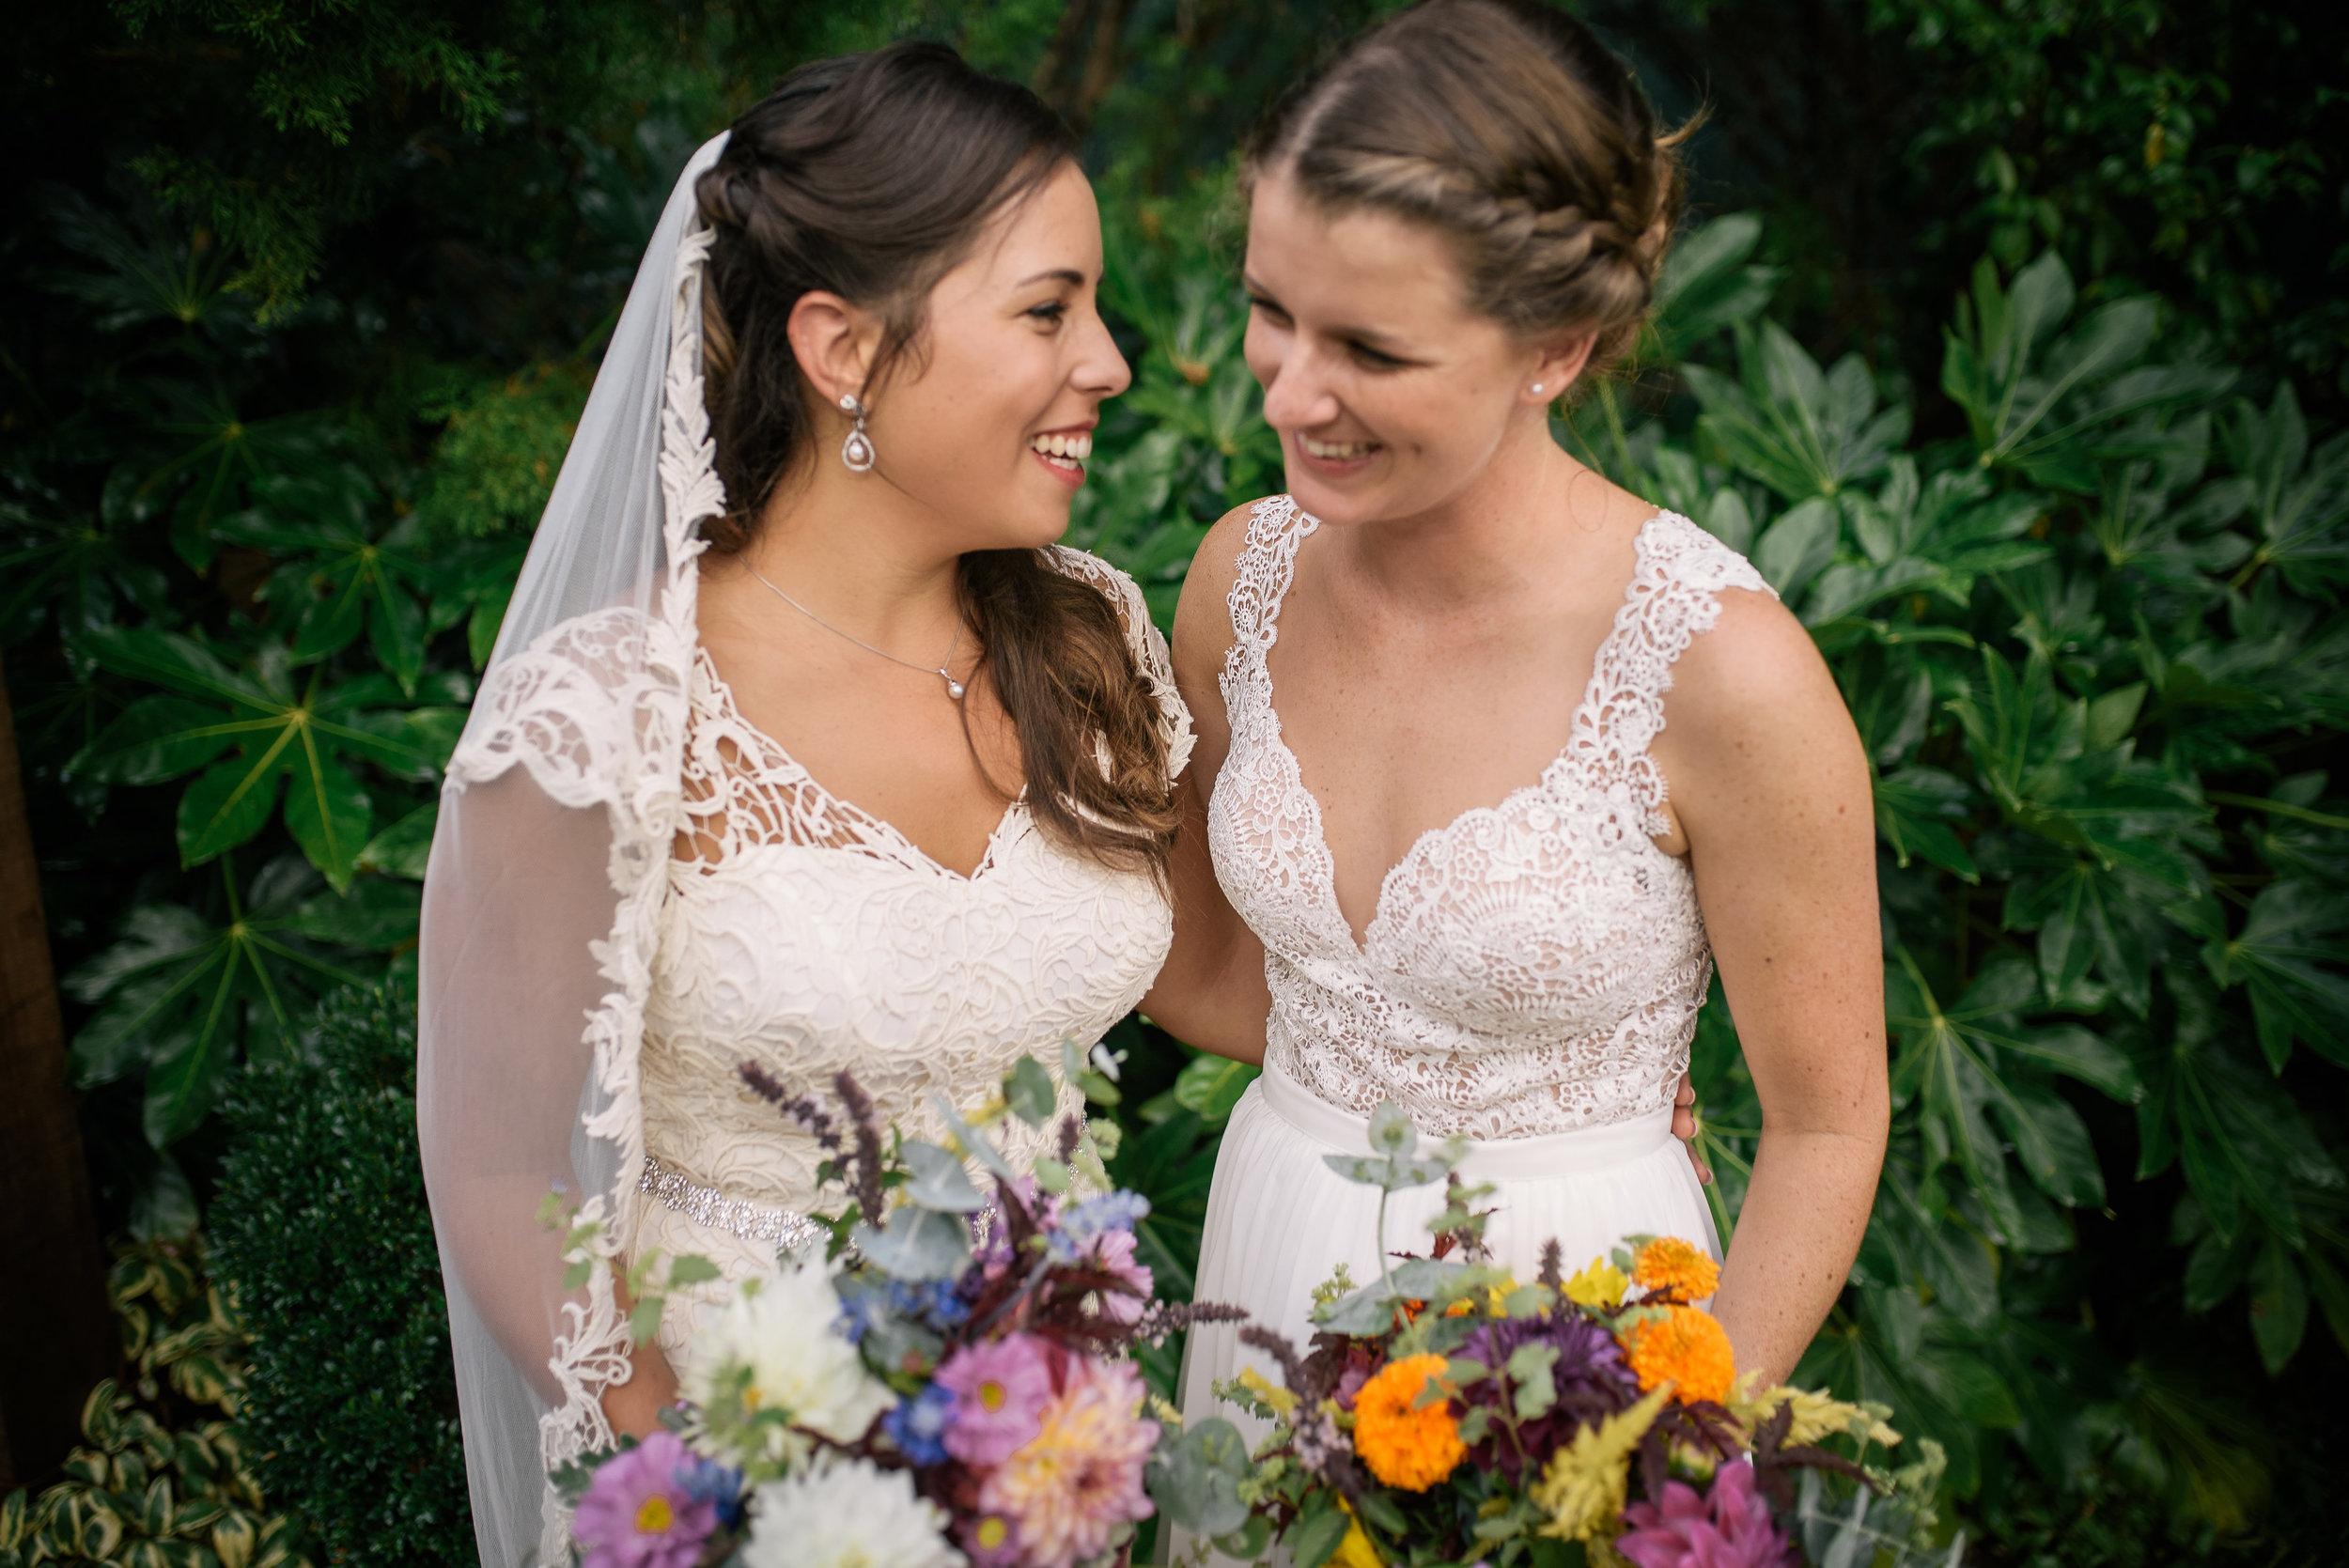 J&E-7098.jpgDurham Wedding Photographer - North Carolina LGBT Wedding